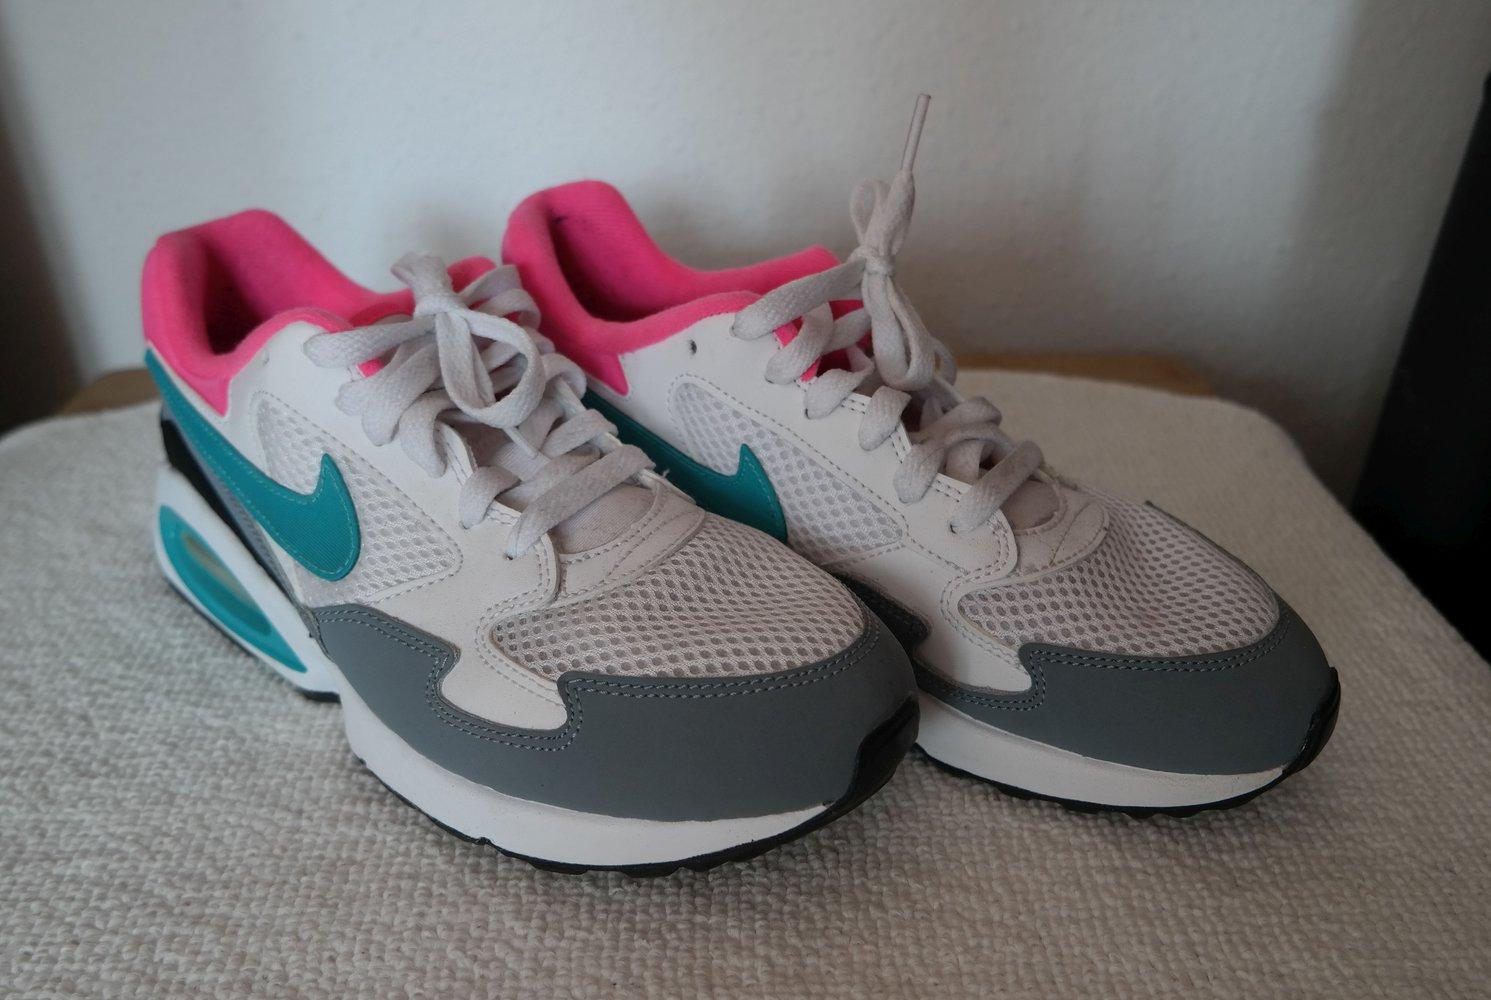 Damen Schuhe::€68.19,Nike Air Max Command Low Top Sneaker